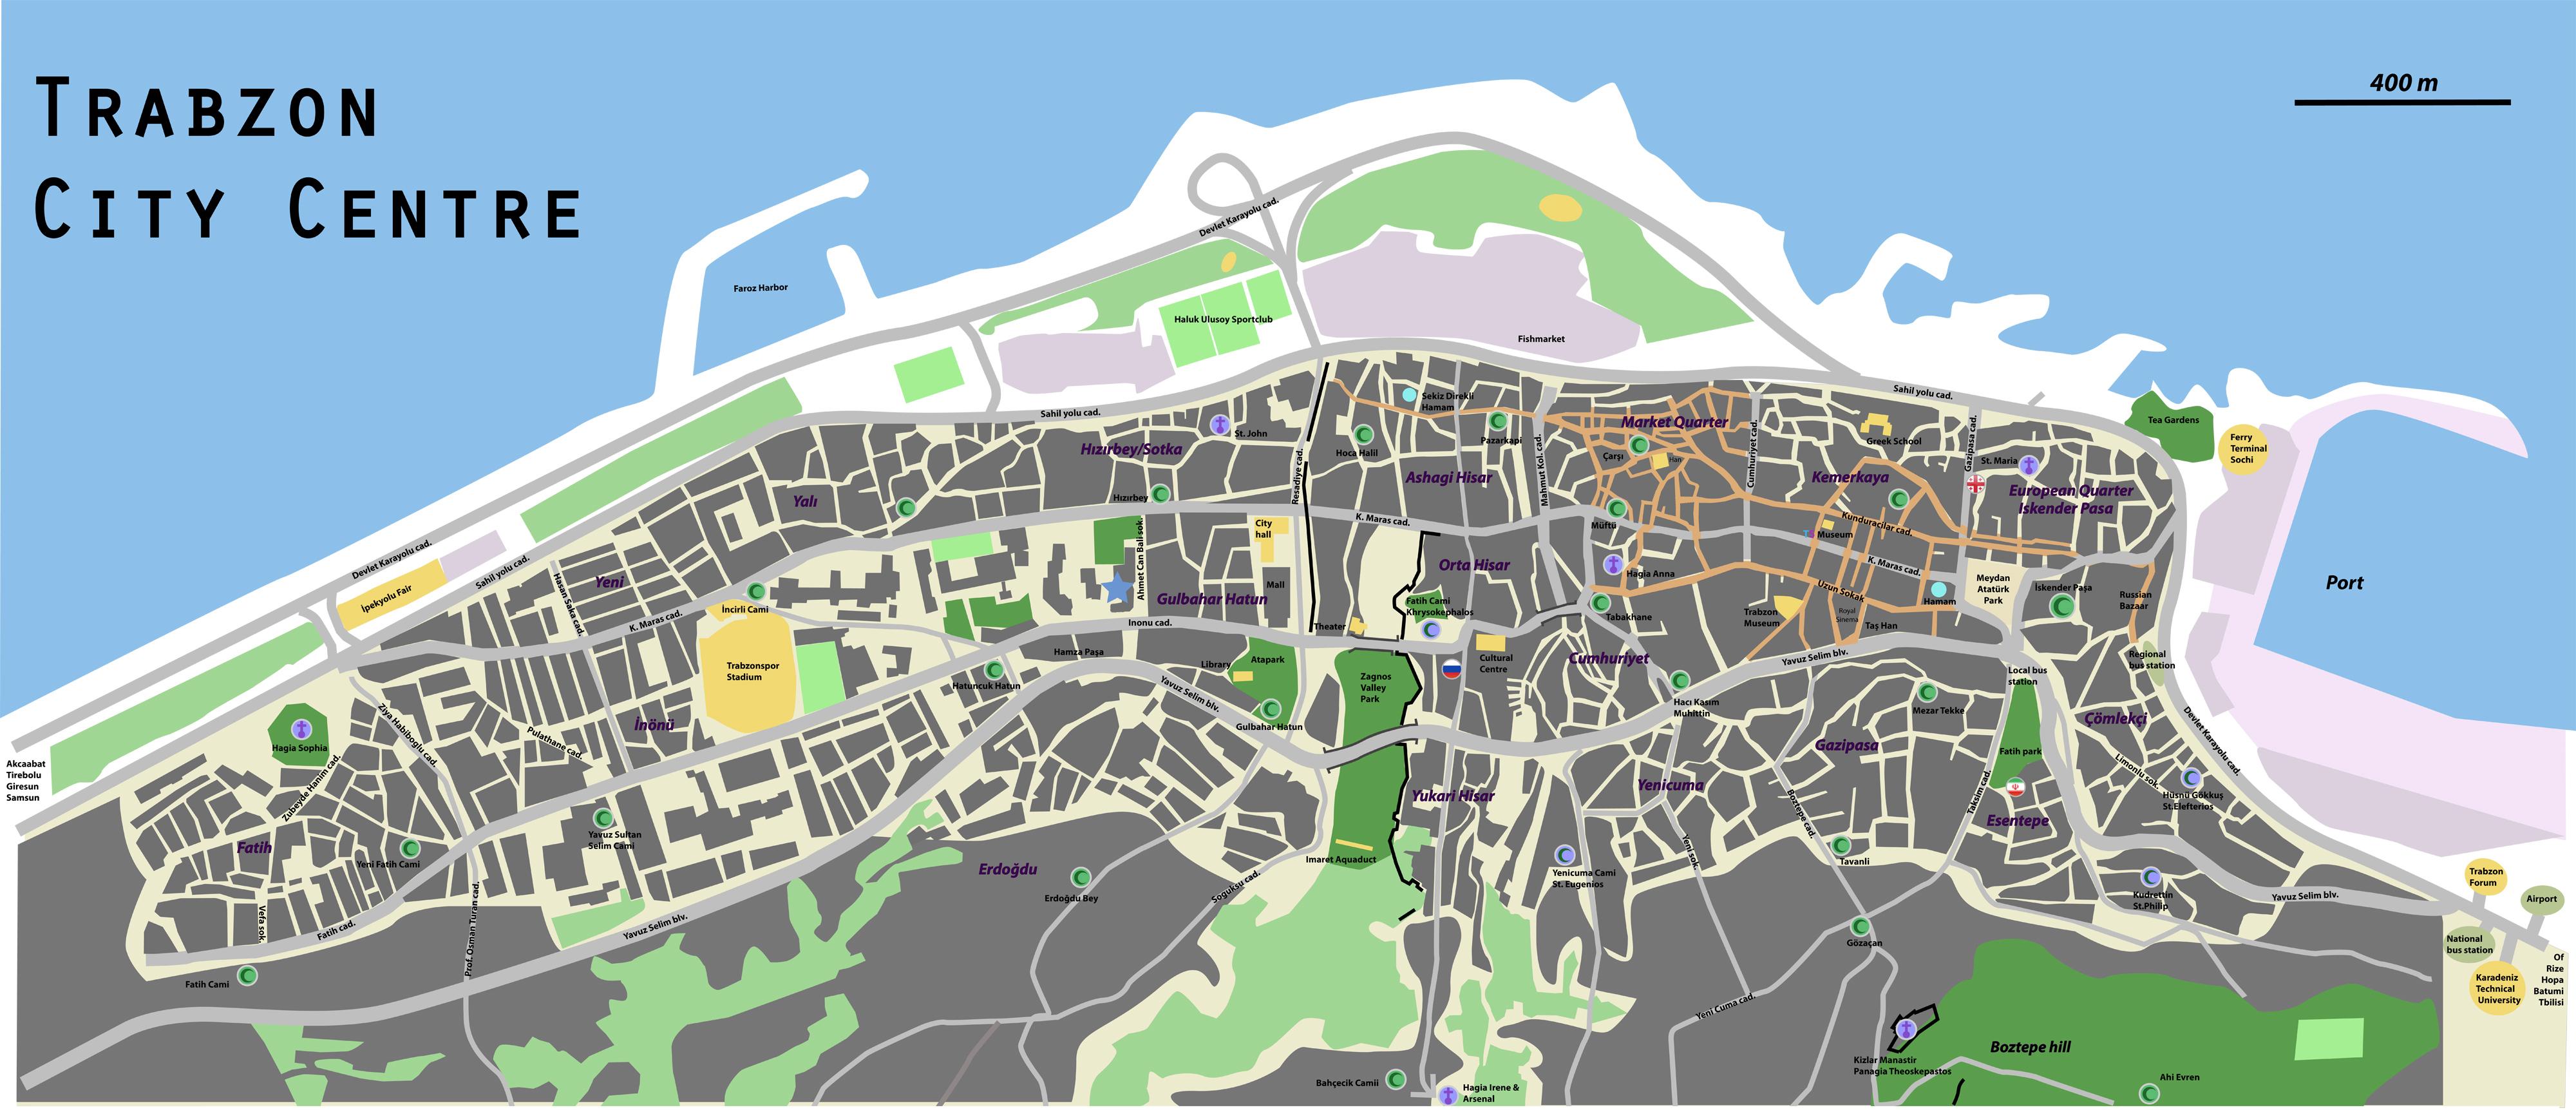 карта трабзона